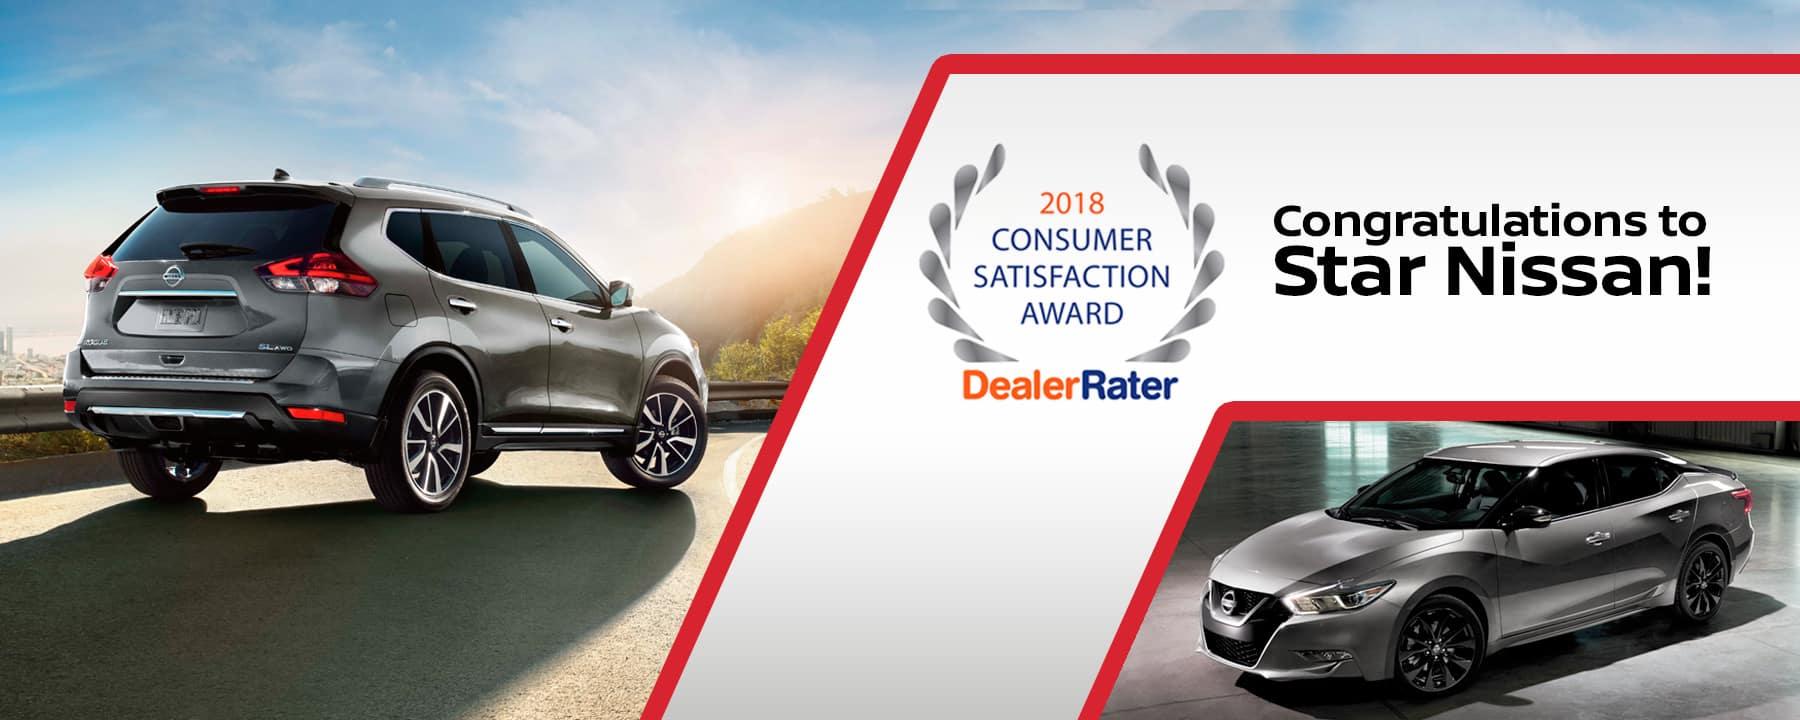 Star Nissan wins DealerRater 2018 Consumer Satisfaction Award!